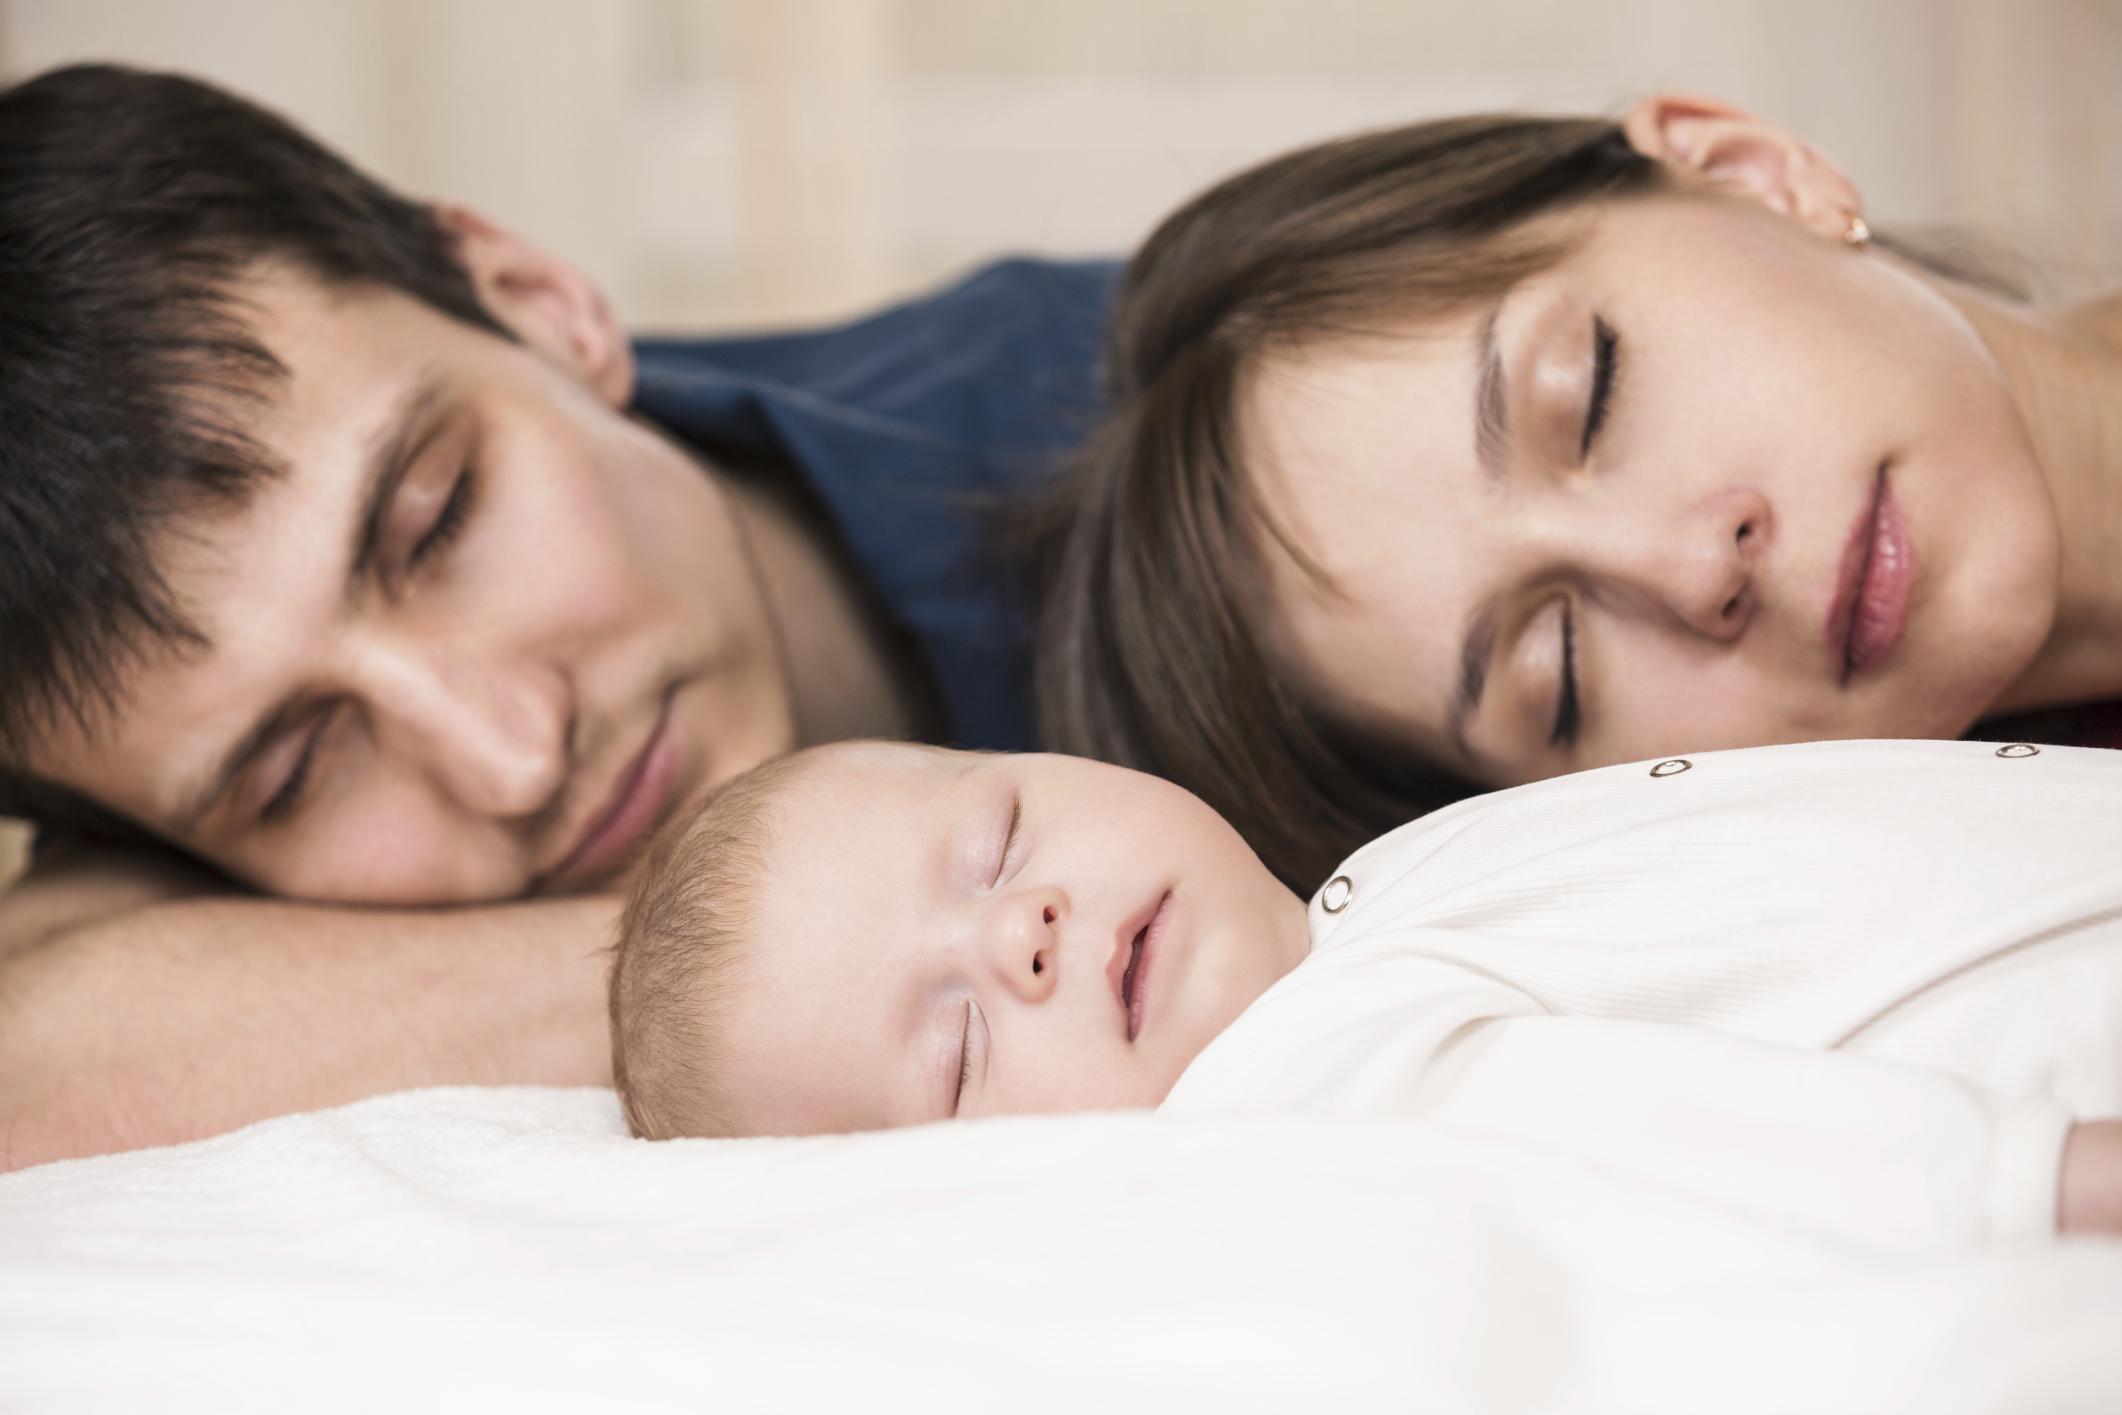 Mother baby bonding activities for dating 5